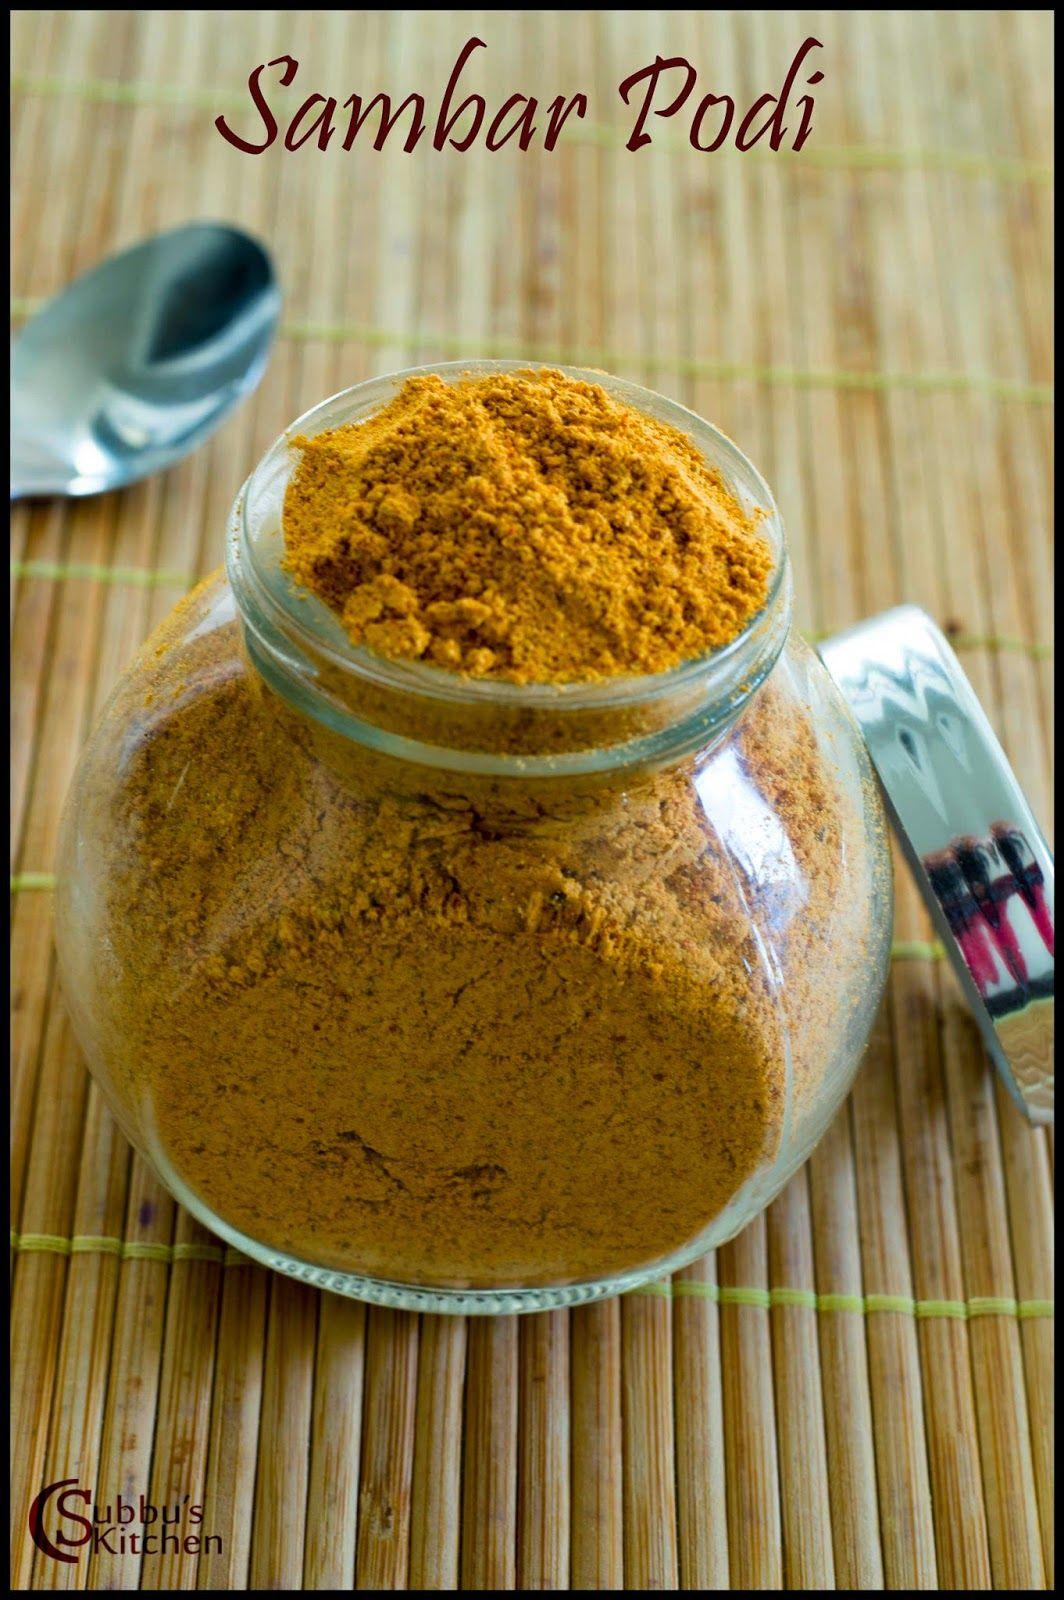 Sambar Podi Sambar Powder Recipe Sweet Meat Homemade Recipes Ingredients Recipes